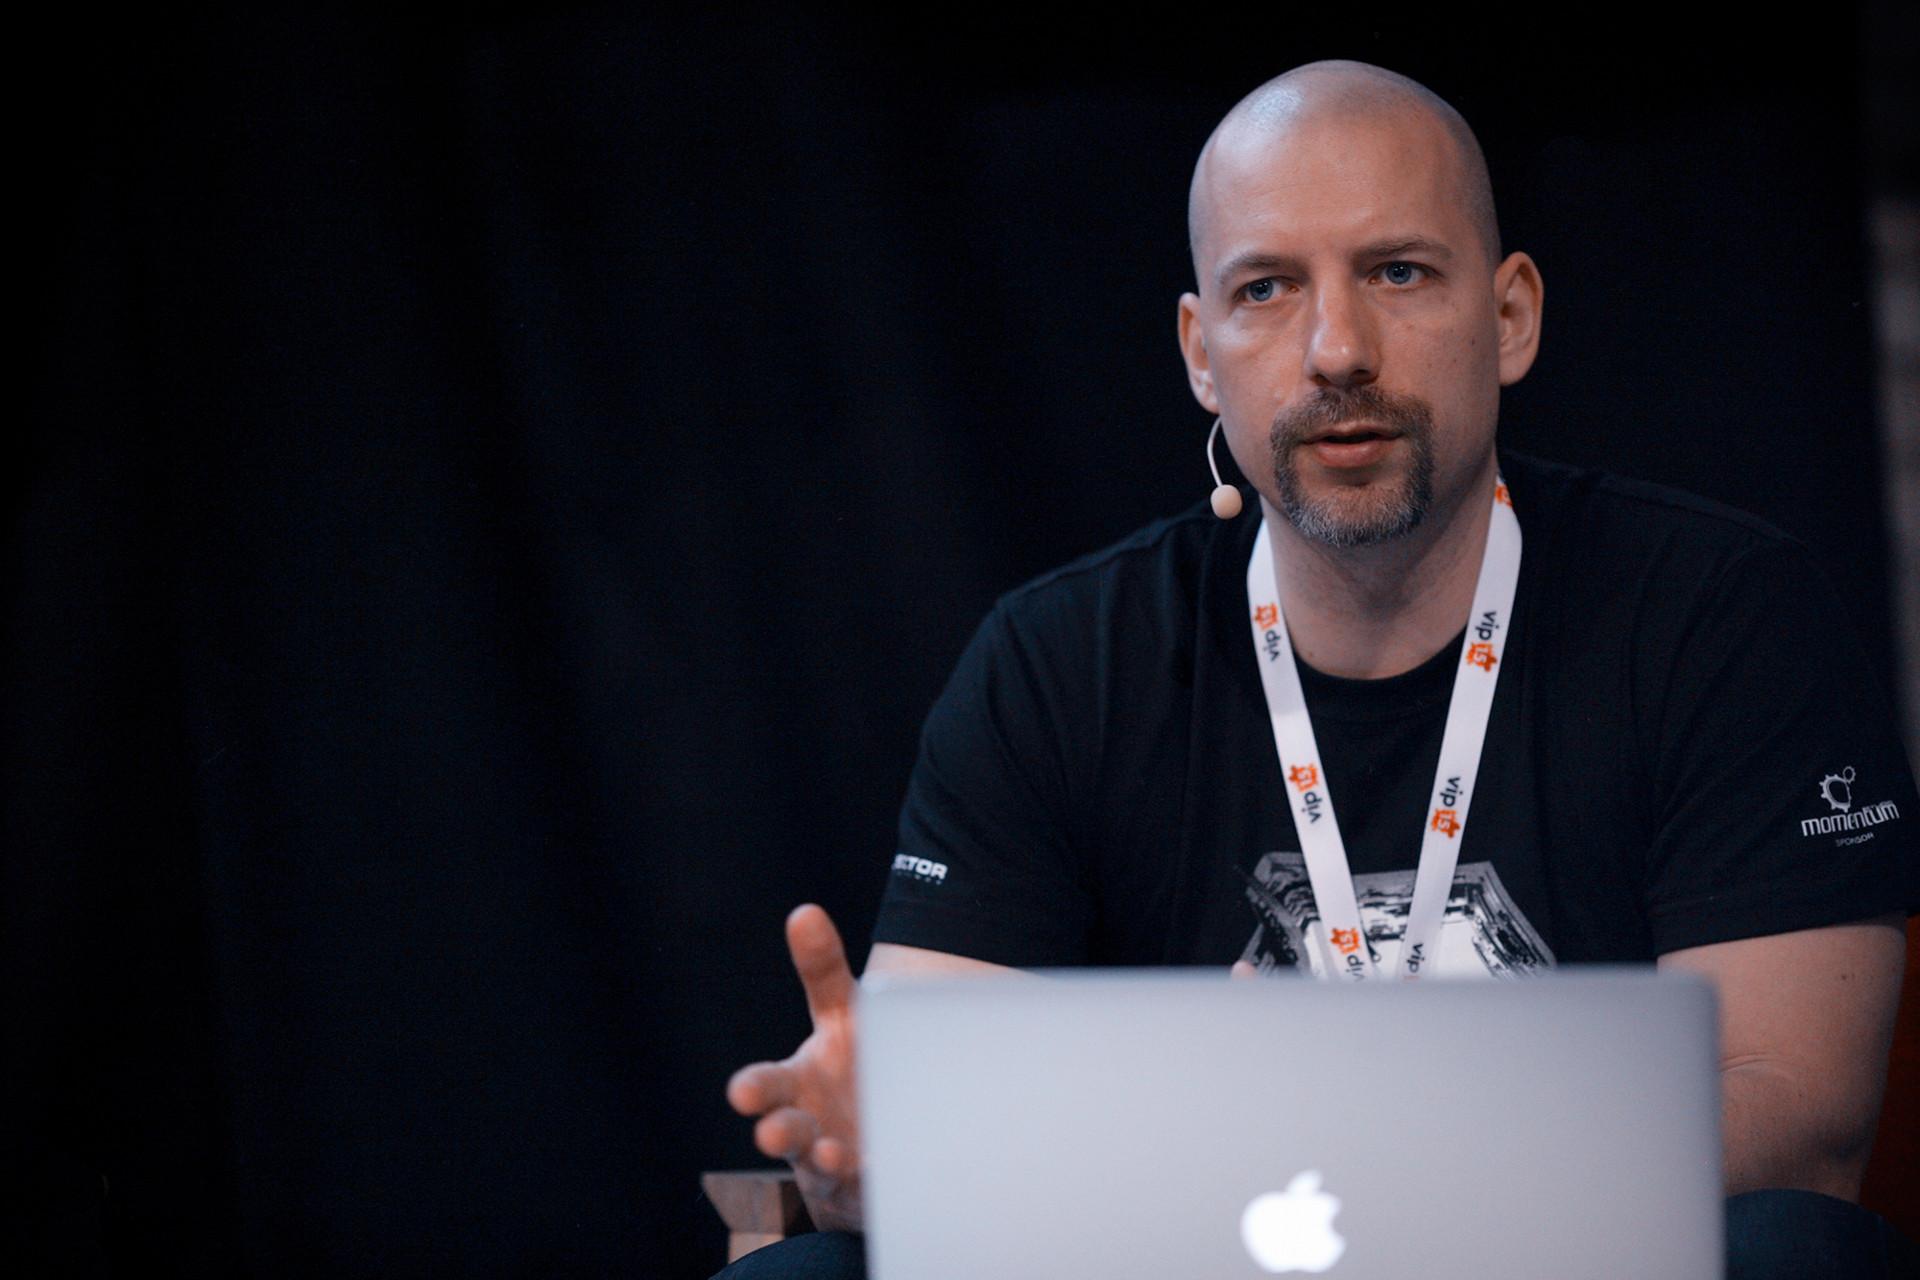 Ivan Šantić, creator of the ArtStation awards